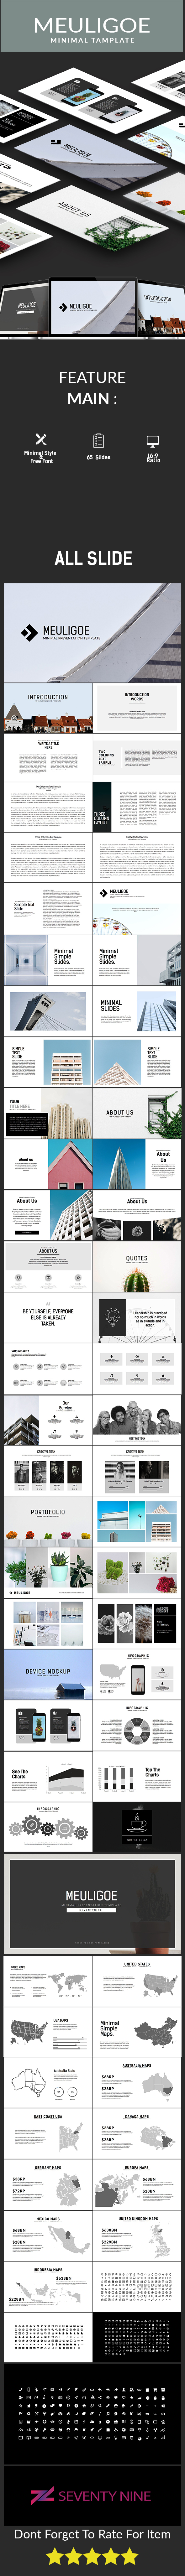 Meuligoe Minimal Presentation Template - PowerPoint Templates Presentation Templates